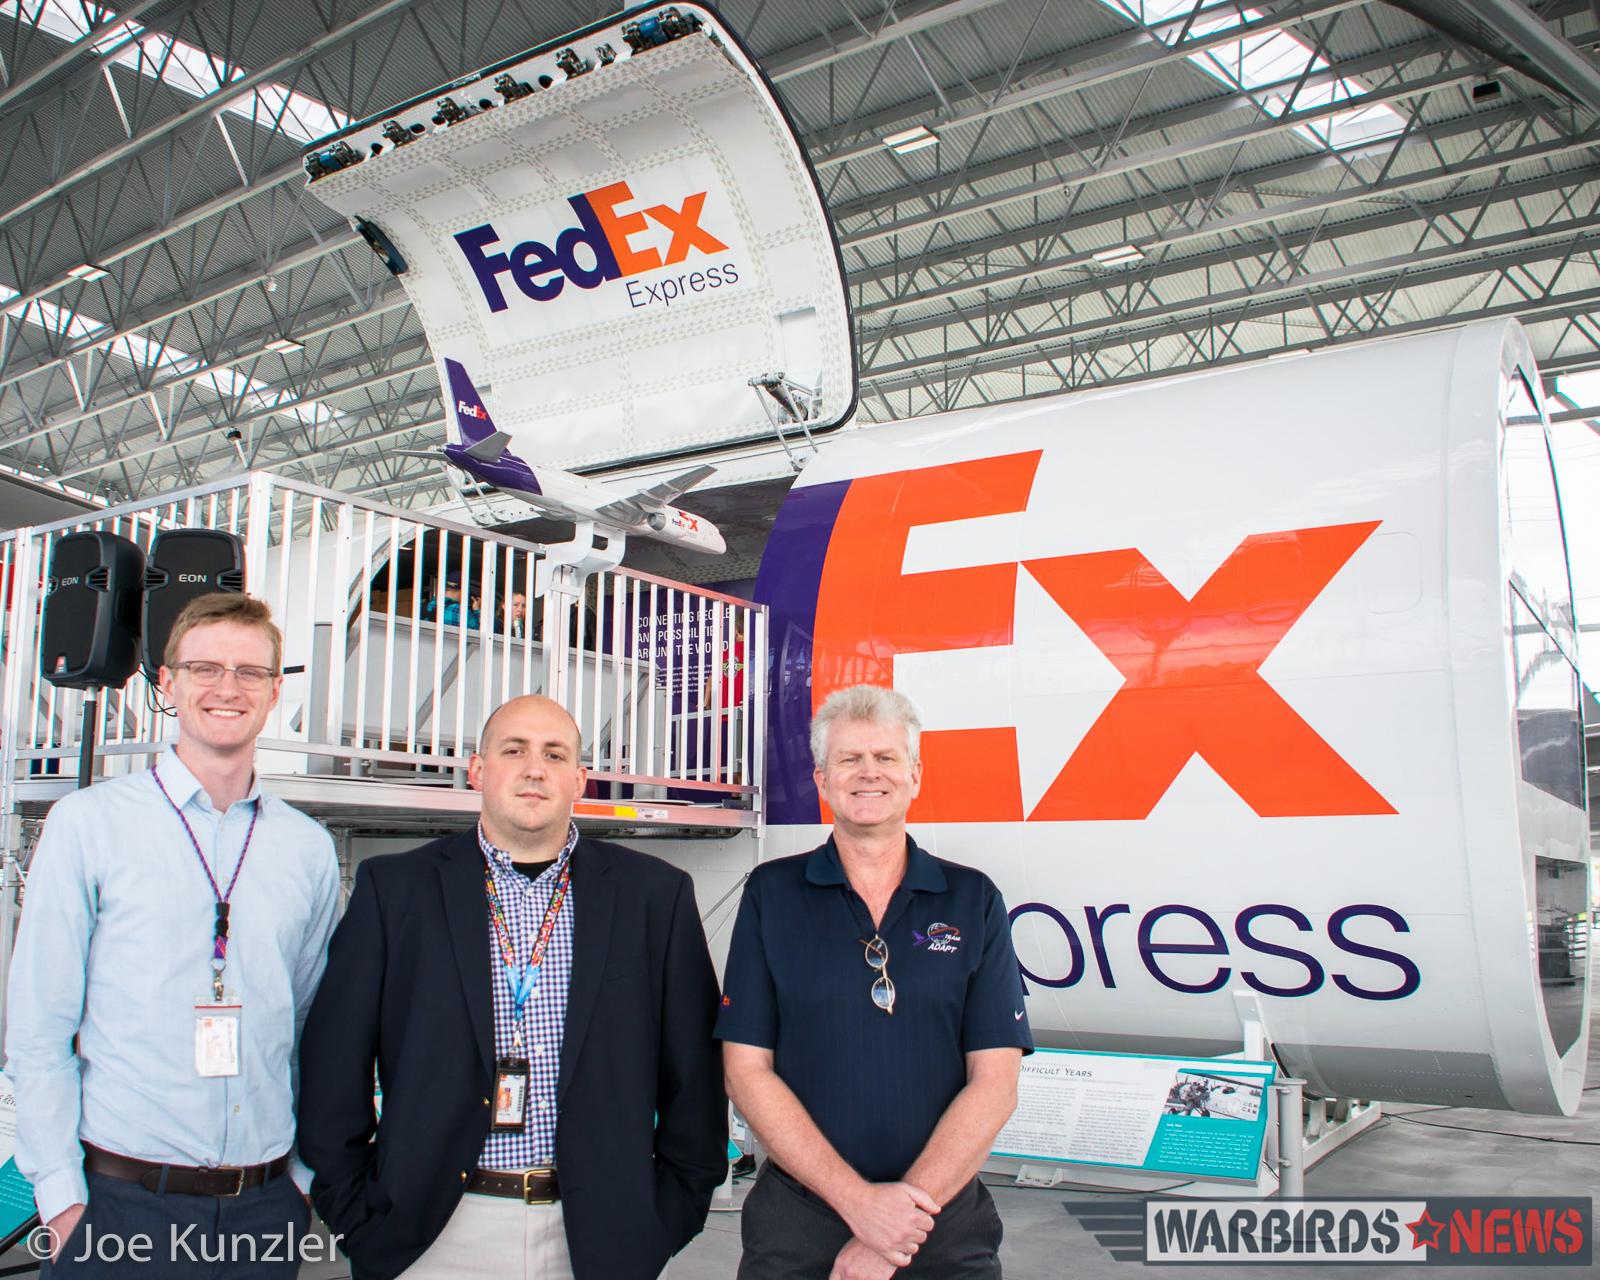 Three of the FedEx exhibit builders including John Talman. (photo by Joe Kunzler)